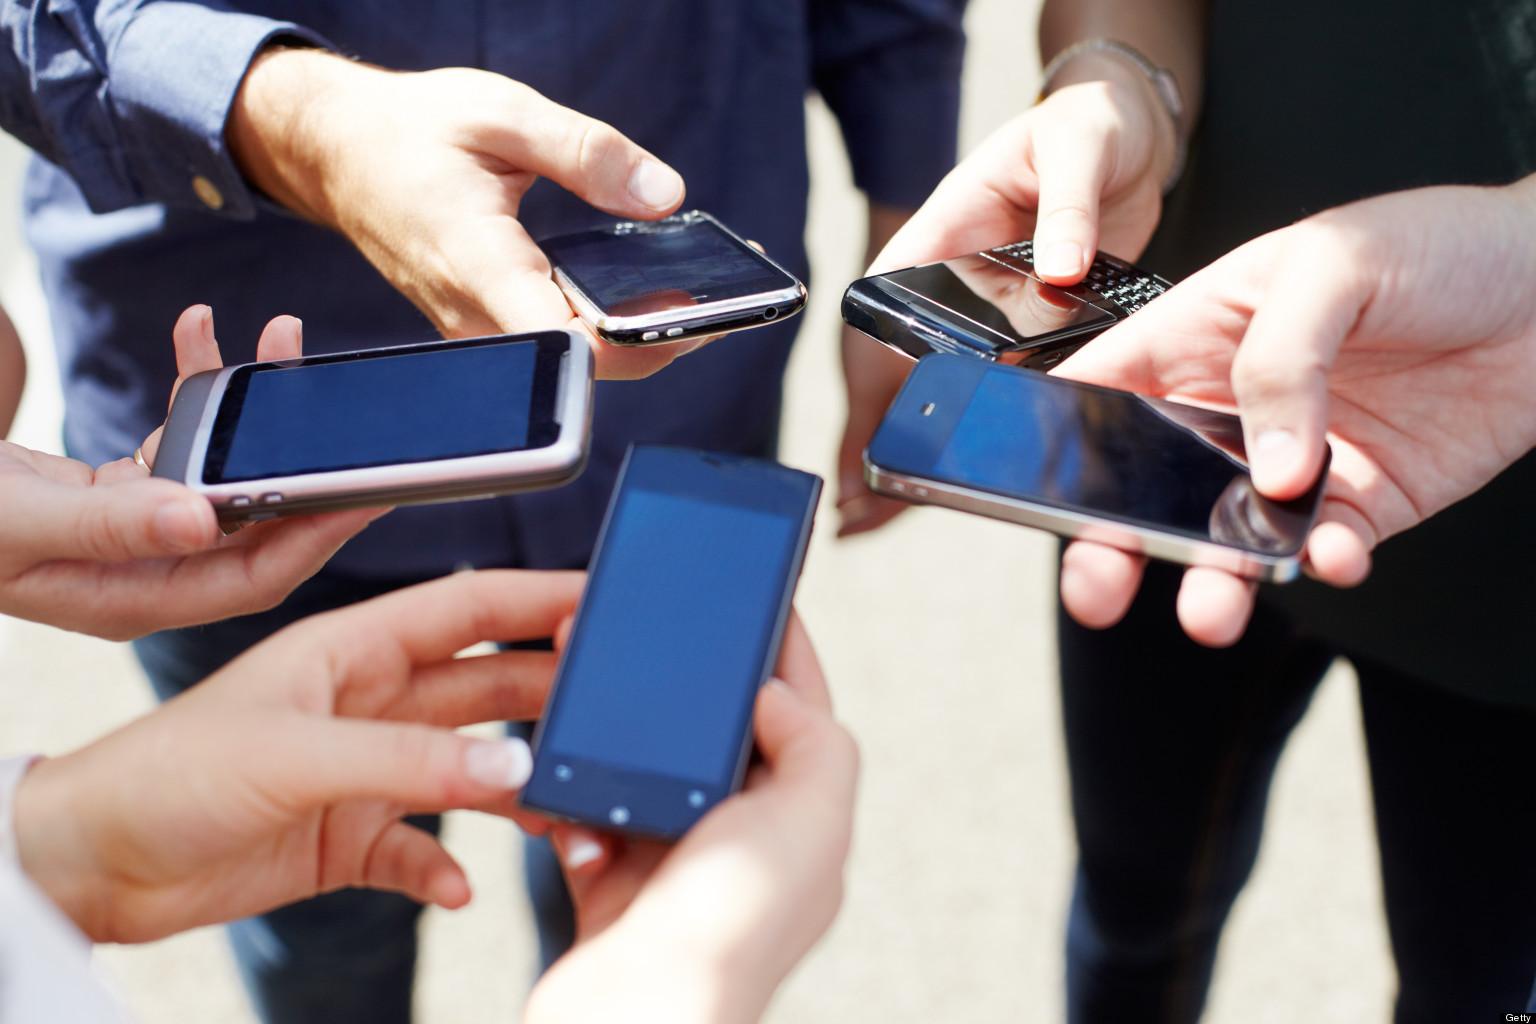 for3-people-using-smartphones.jpg